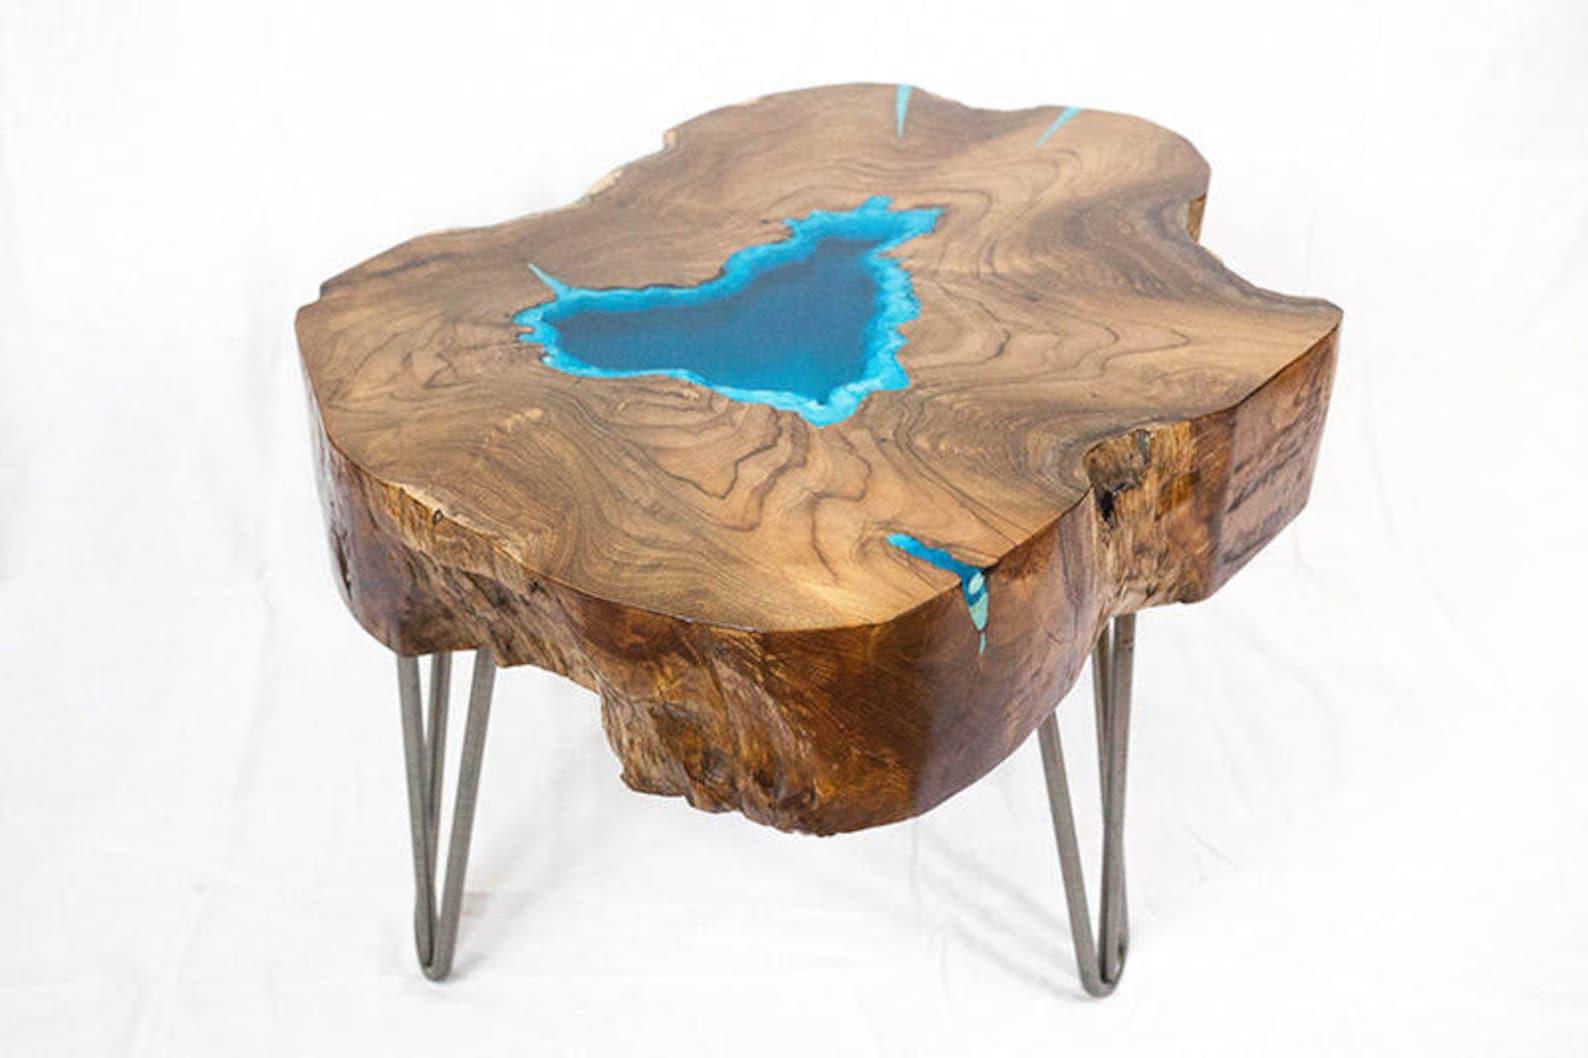 Wooden Bookshelf Cum Coffee Table In Solid Sheesham Wood Space Saver